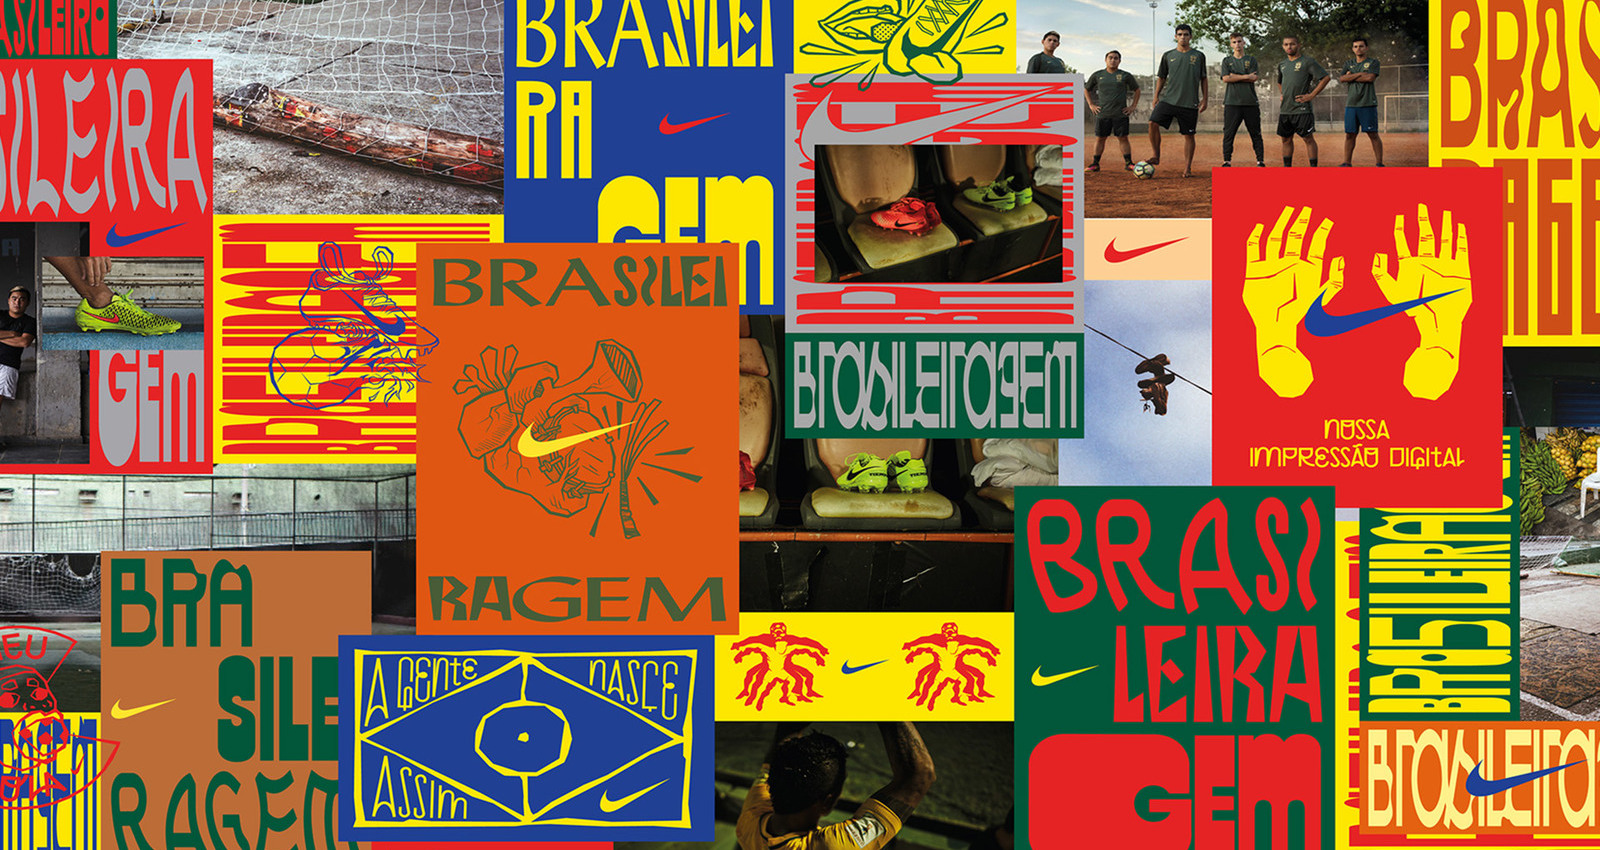 Brasileiragem Visual Identity